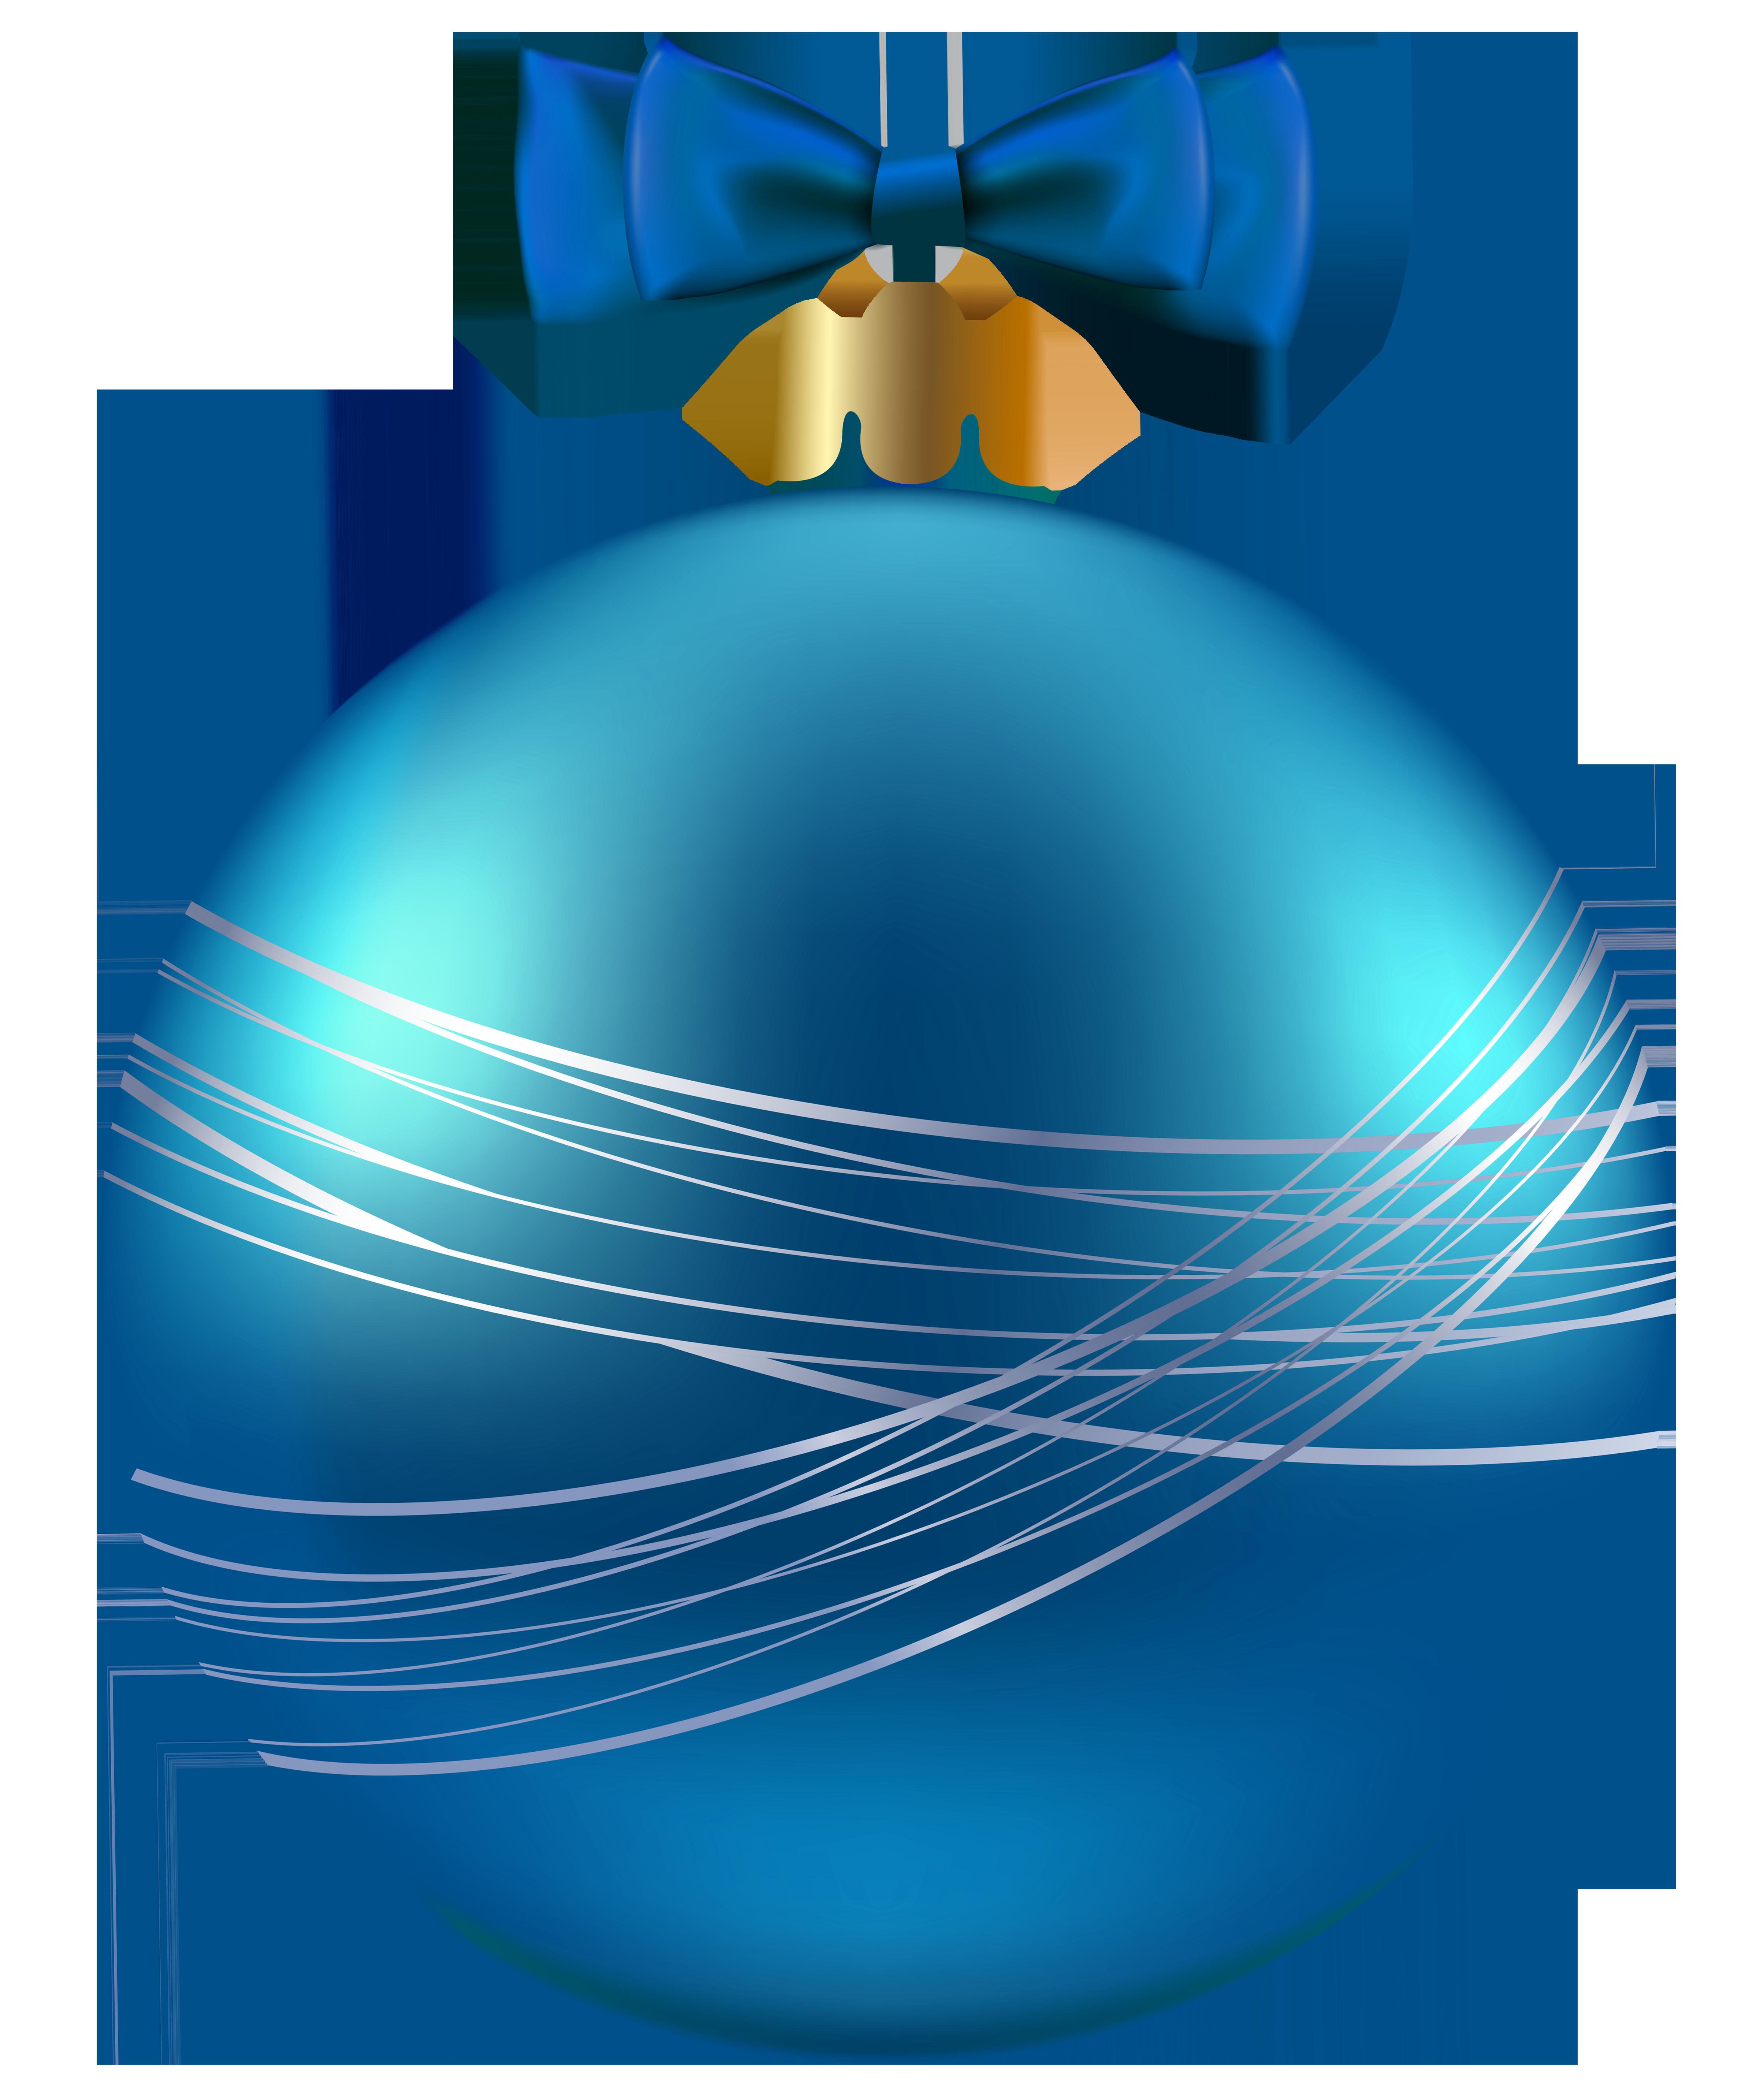 Christmas ornaments images clipart svg transparent Blue Christmas Ornament PNG Clipart Image | Gallery Yopriceville ... svg transparent